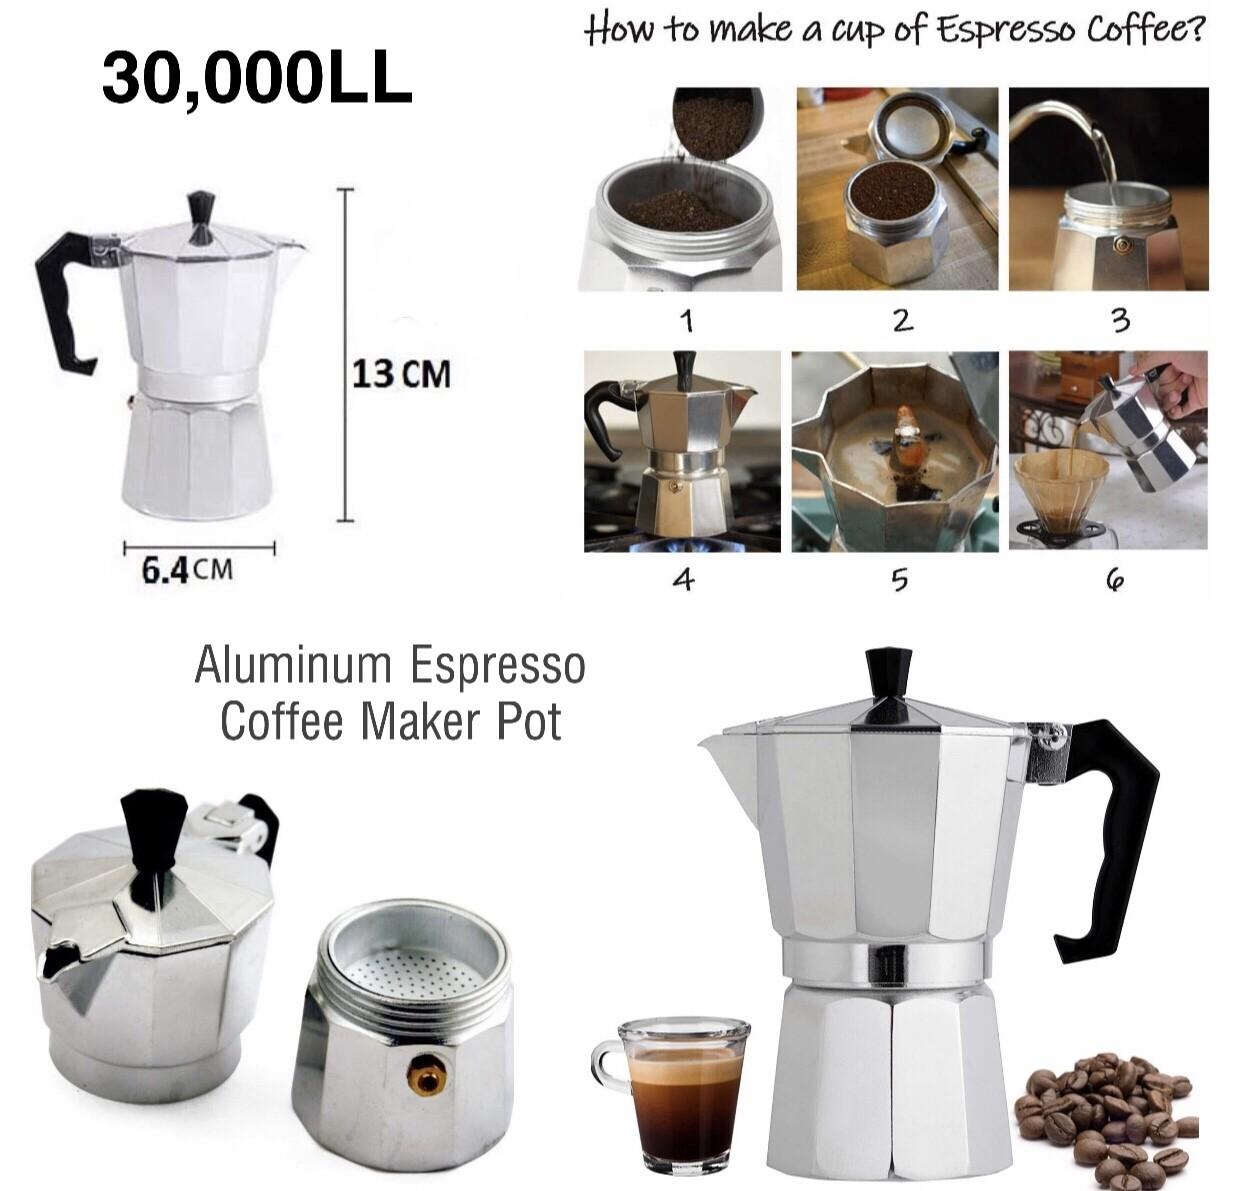 Espresso Coffee Maker Pot